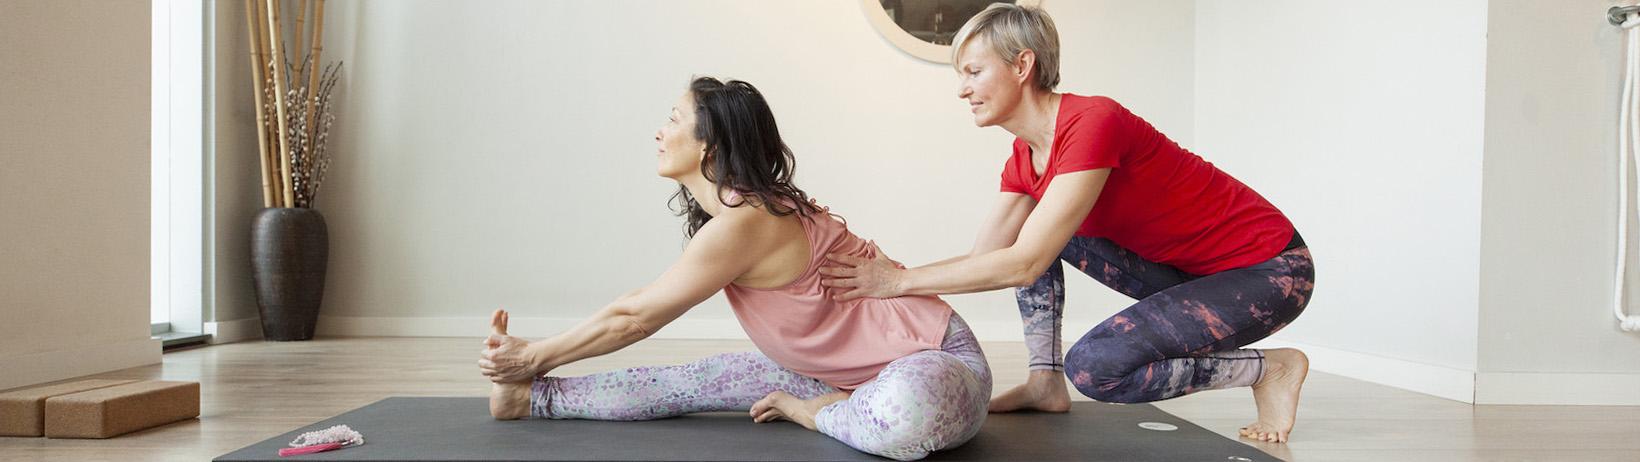 Personal Training Yoga & Pilates